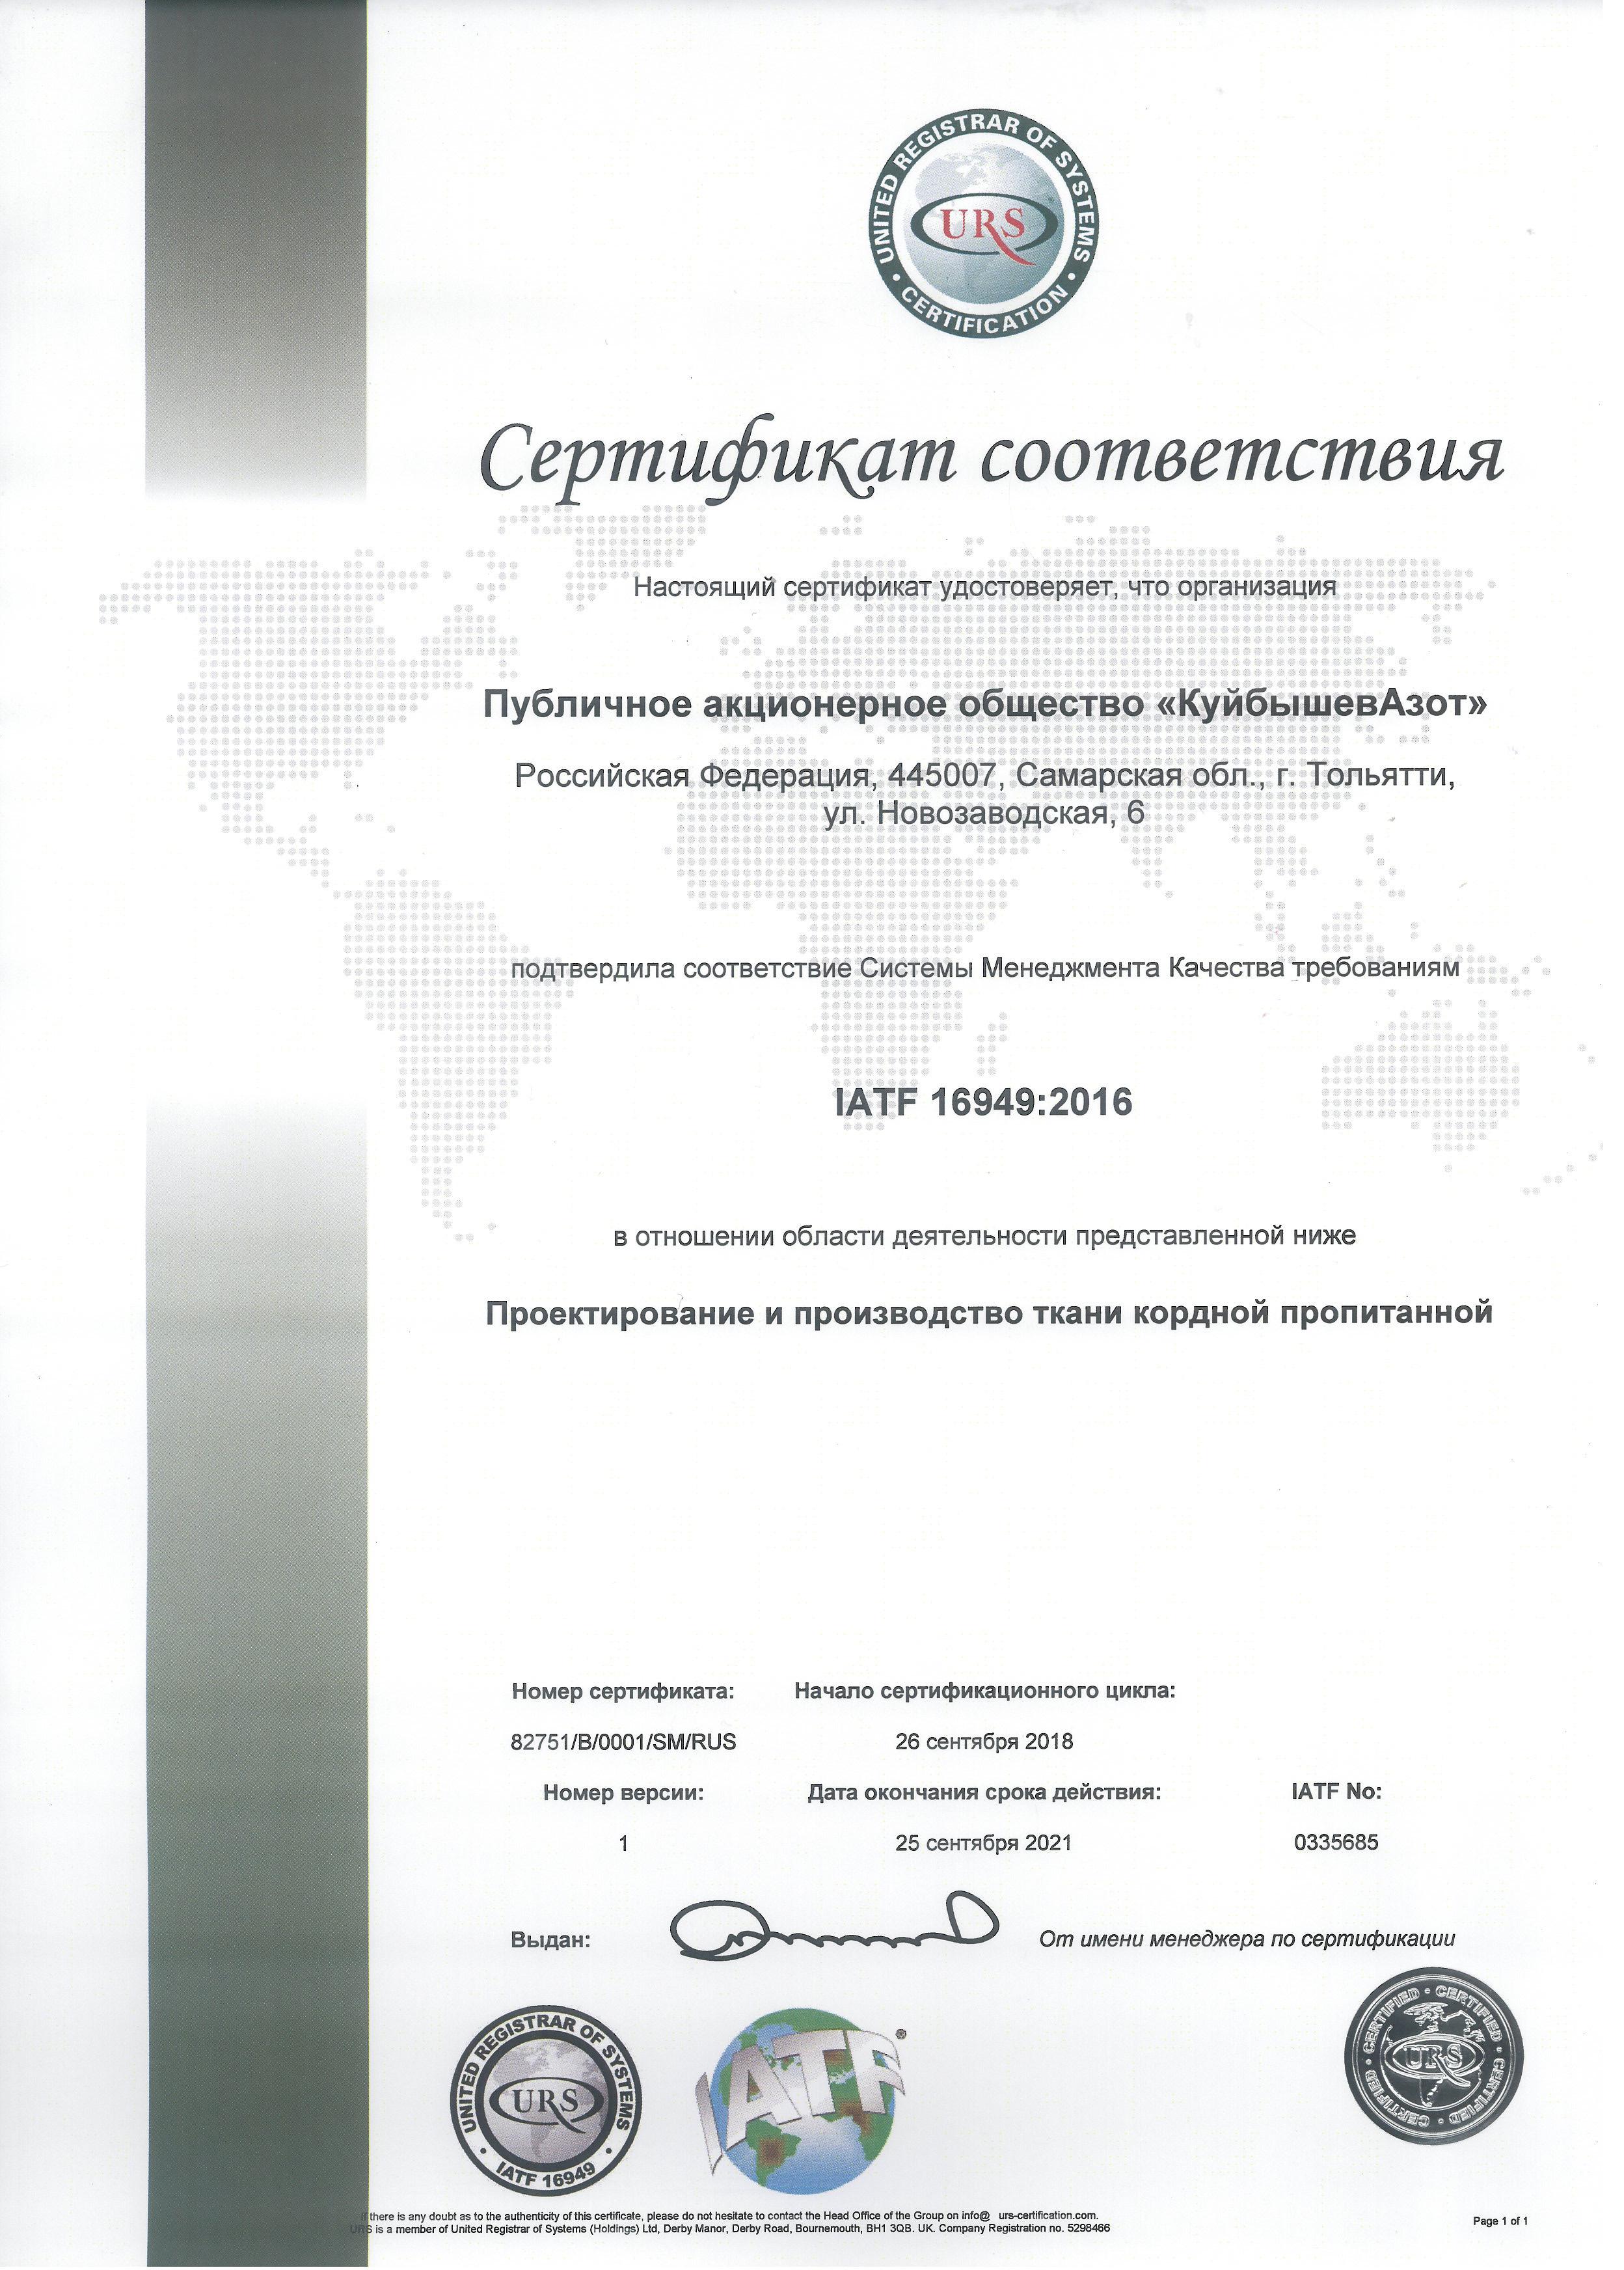 Сертификат IATF 16949:2016